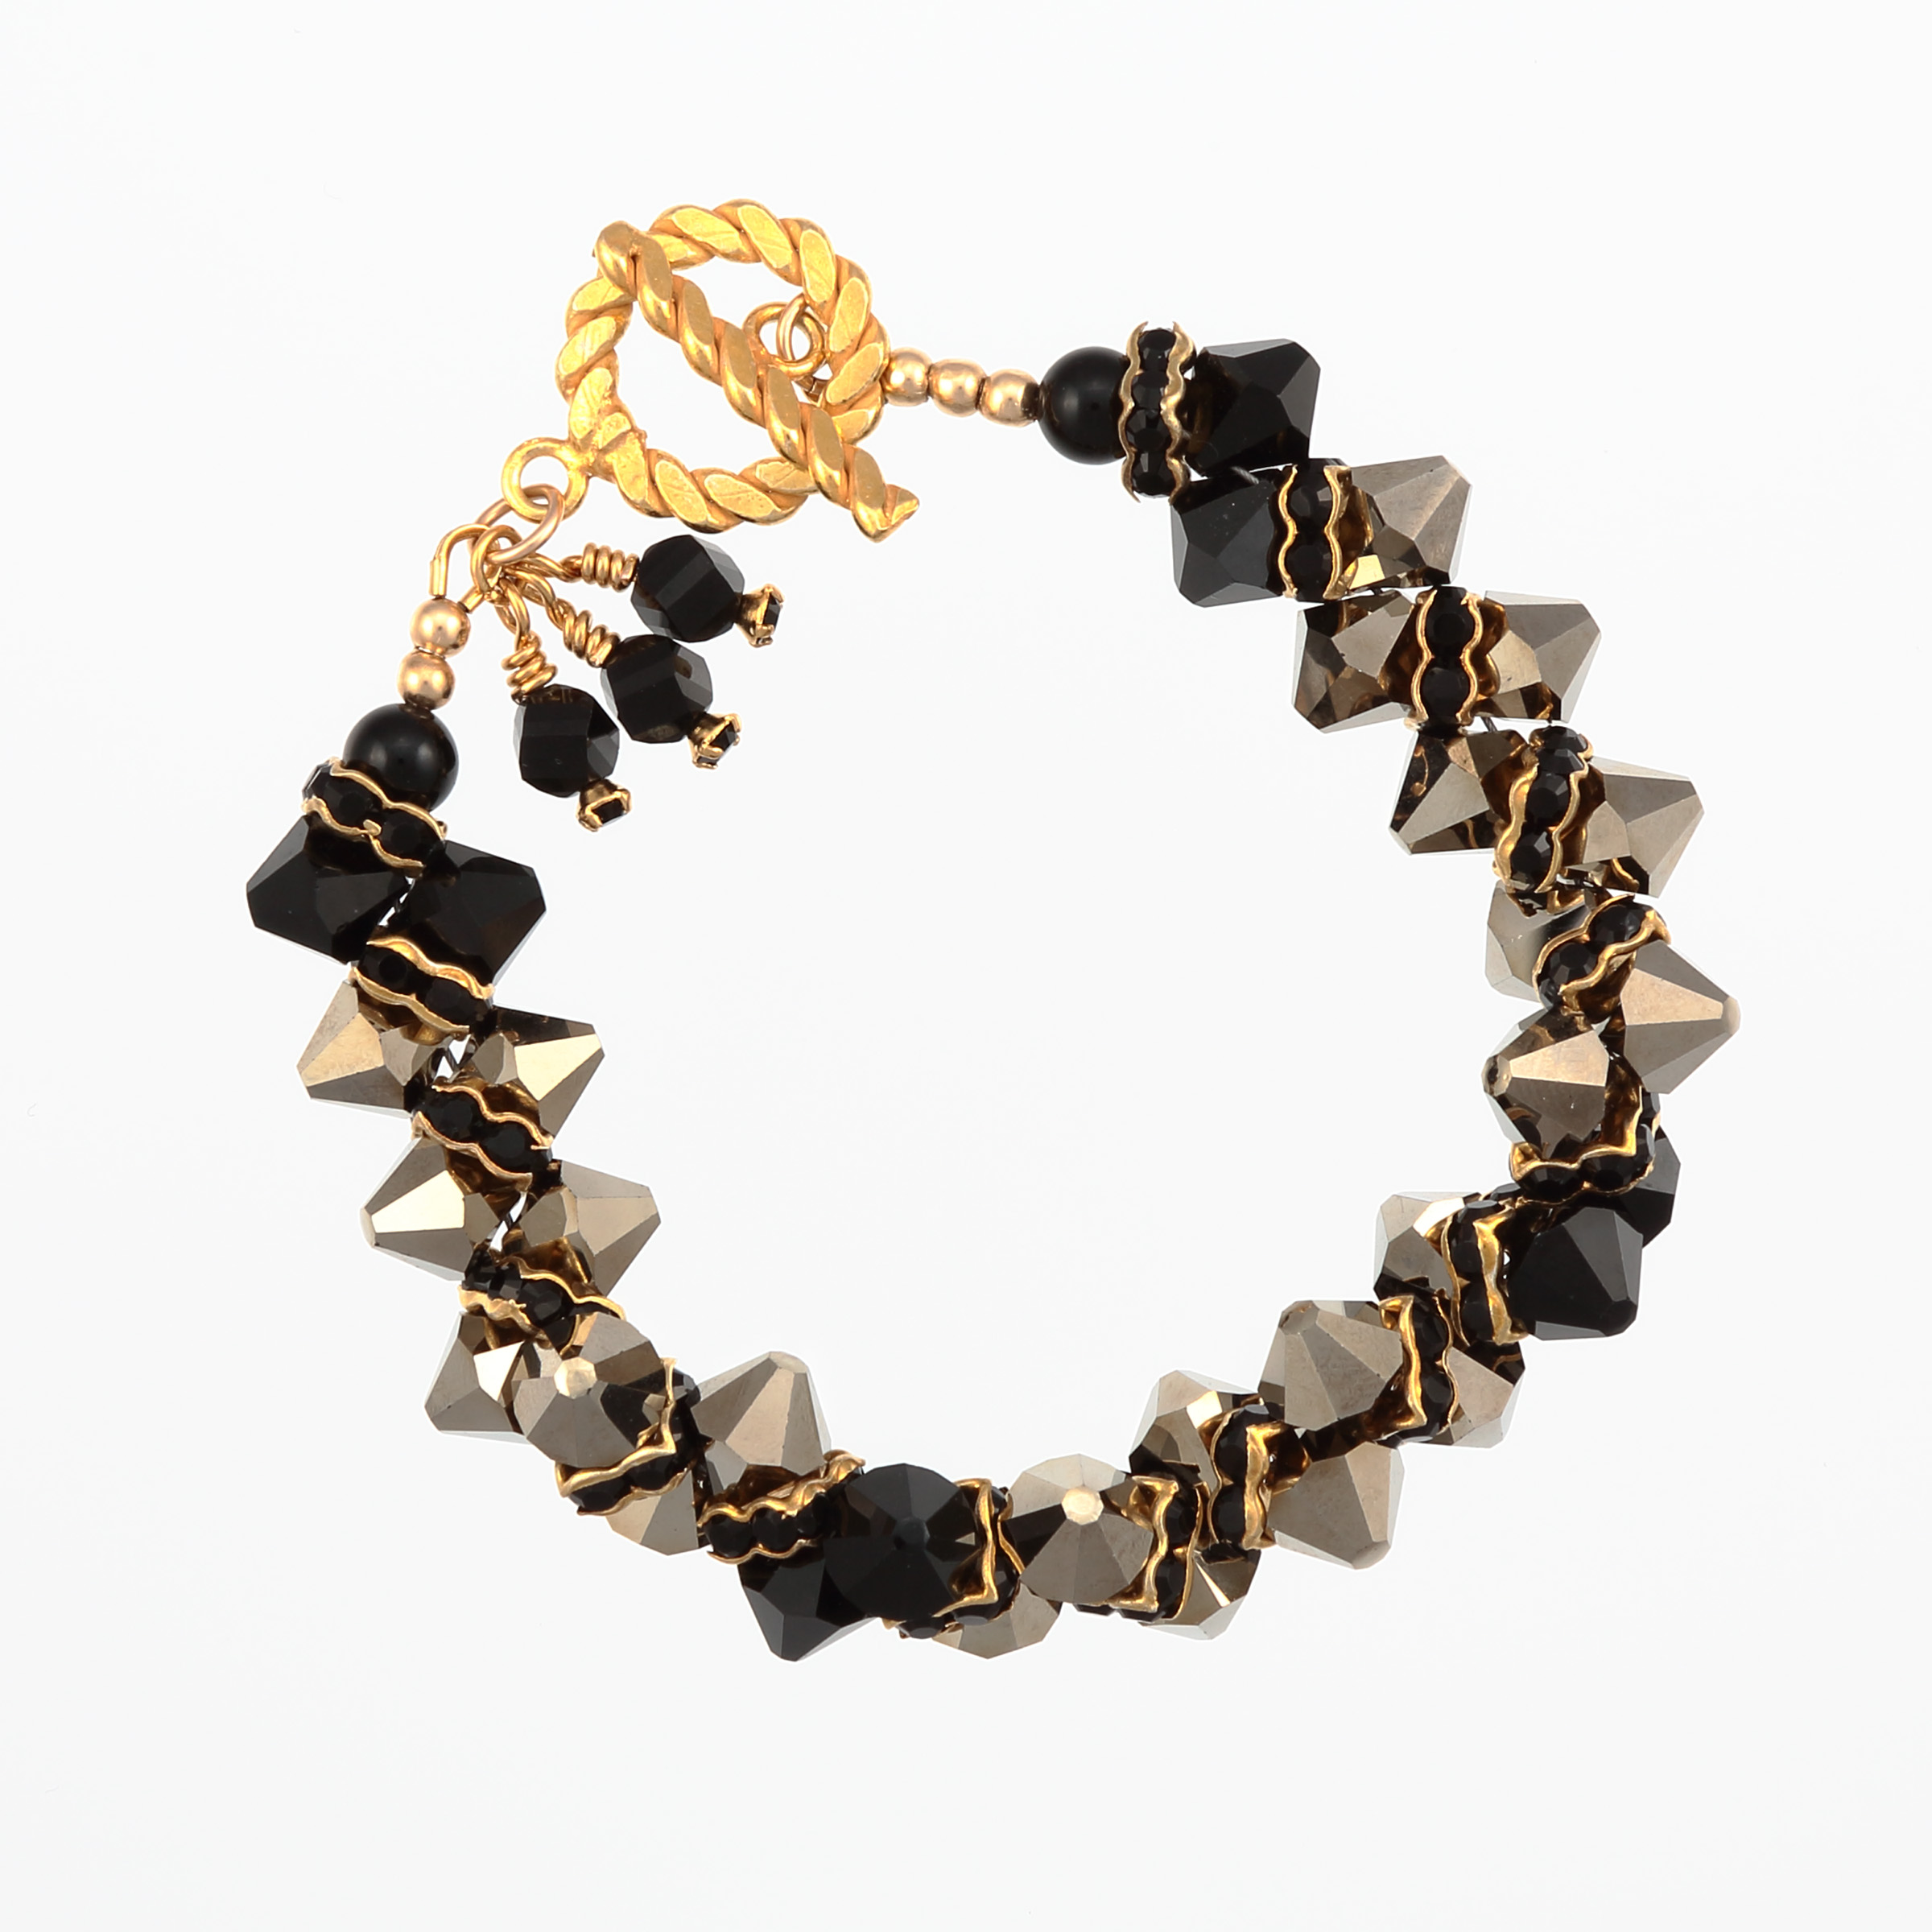 Texas Tea Rock Candy Bracelet – Swarovski Crystal